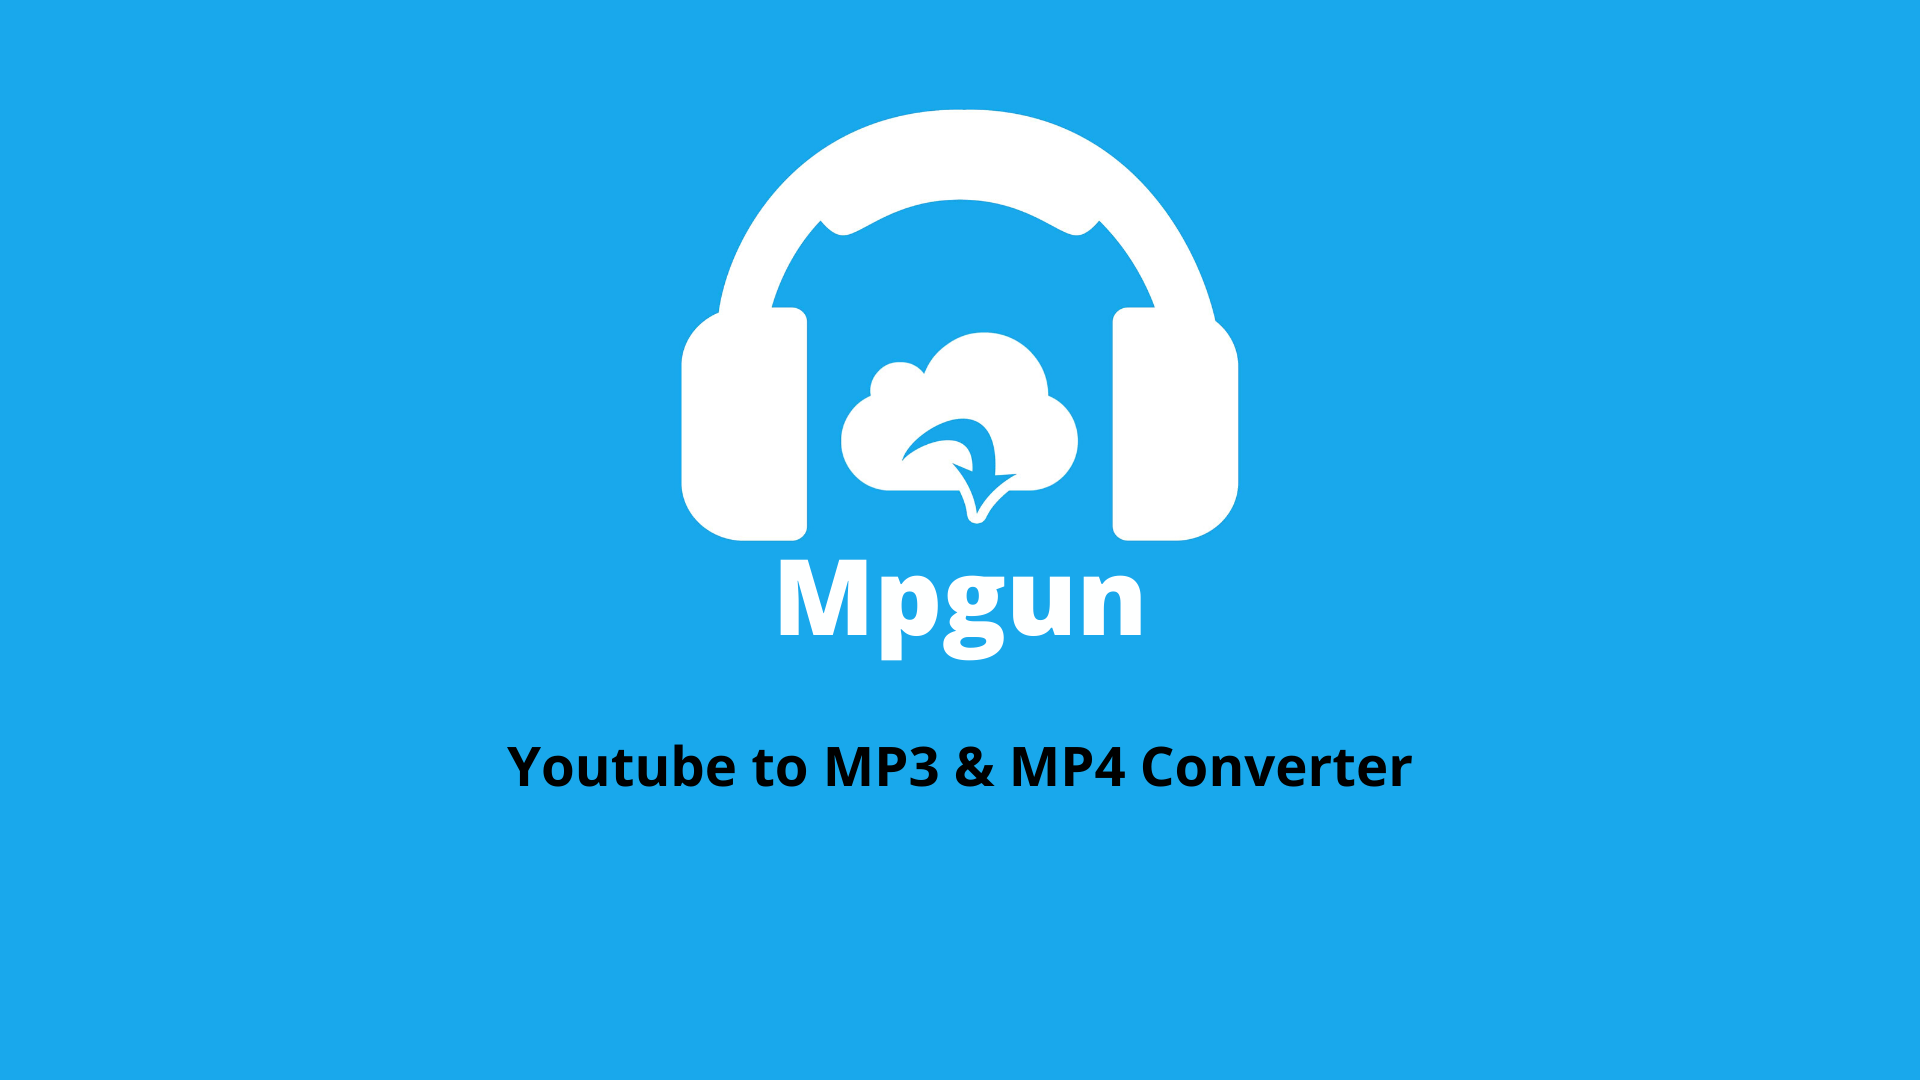 Mpgun Youtube Converter